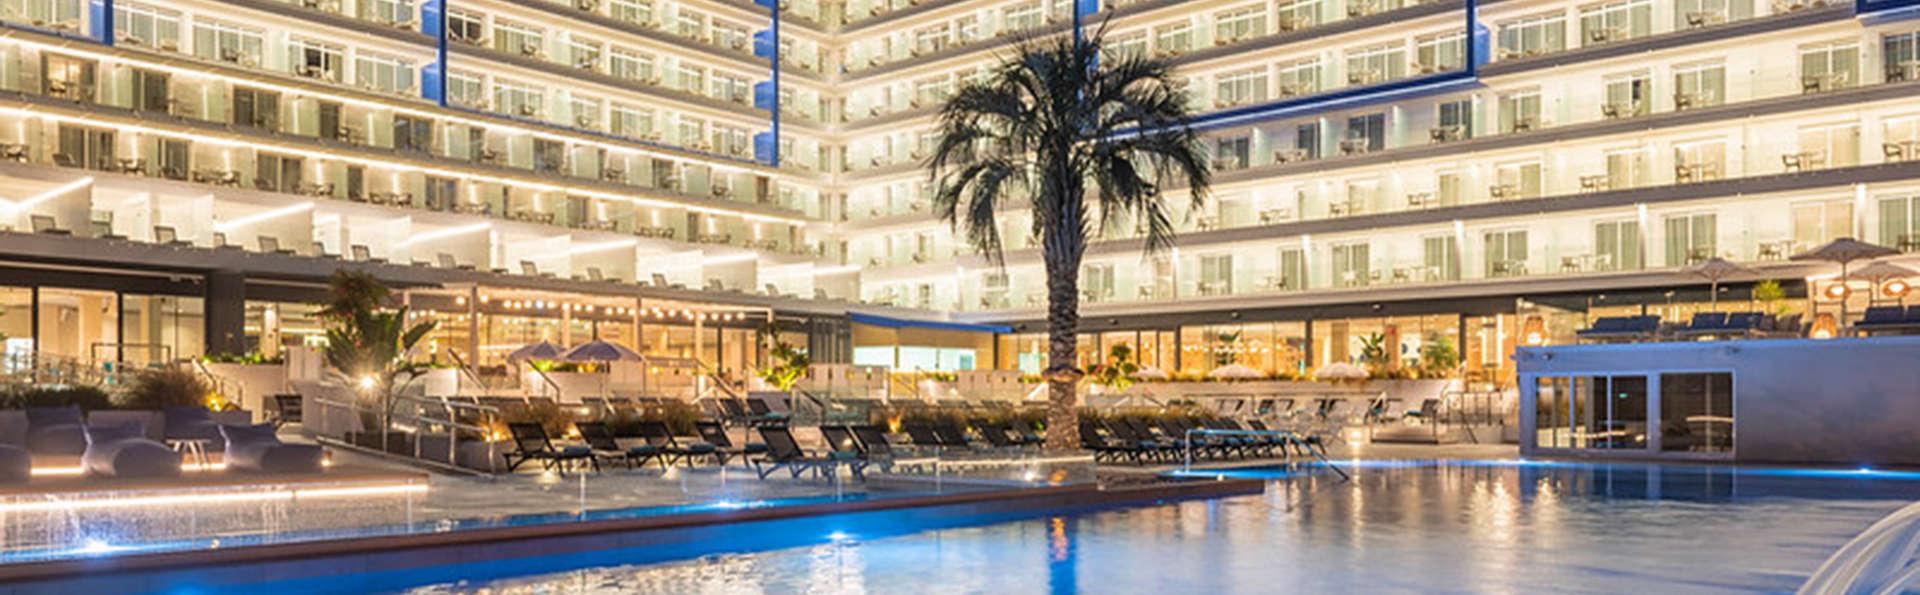 Hotel l'Azure - EDIT_FRONT_Y_PISCINA.jpg